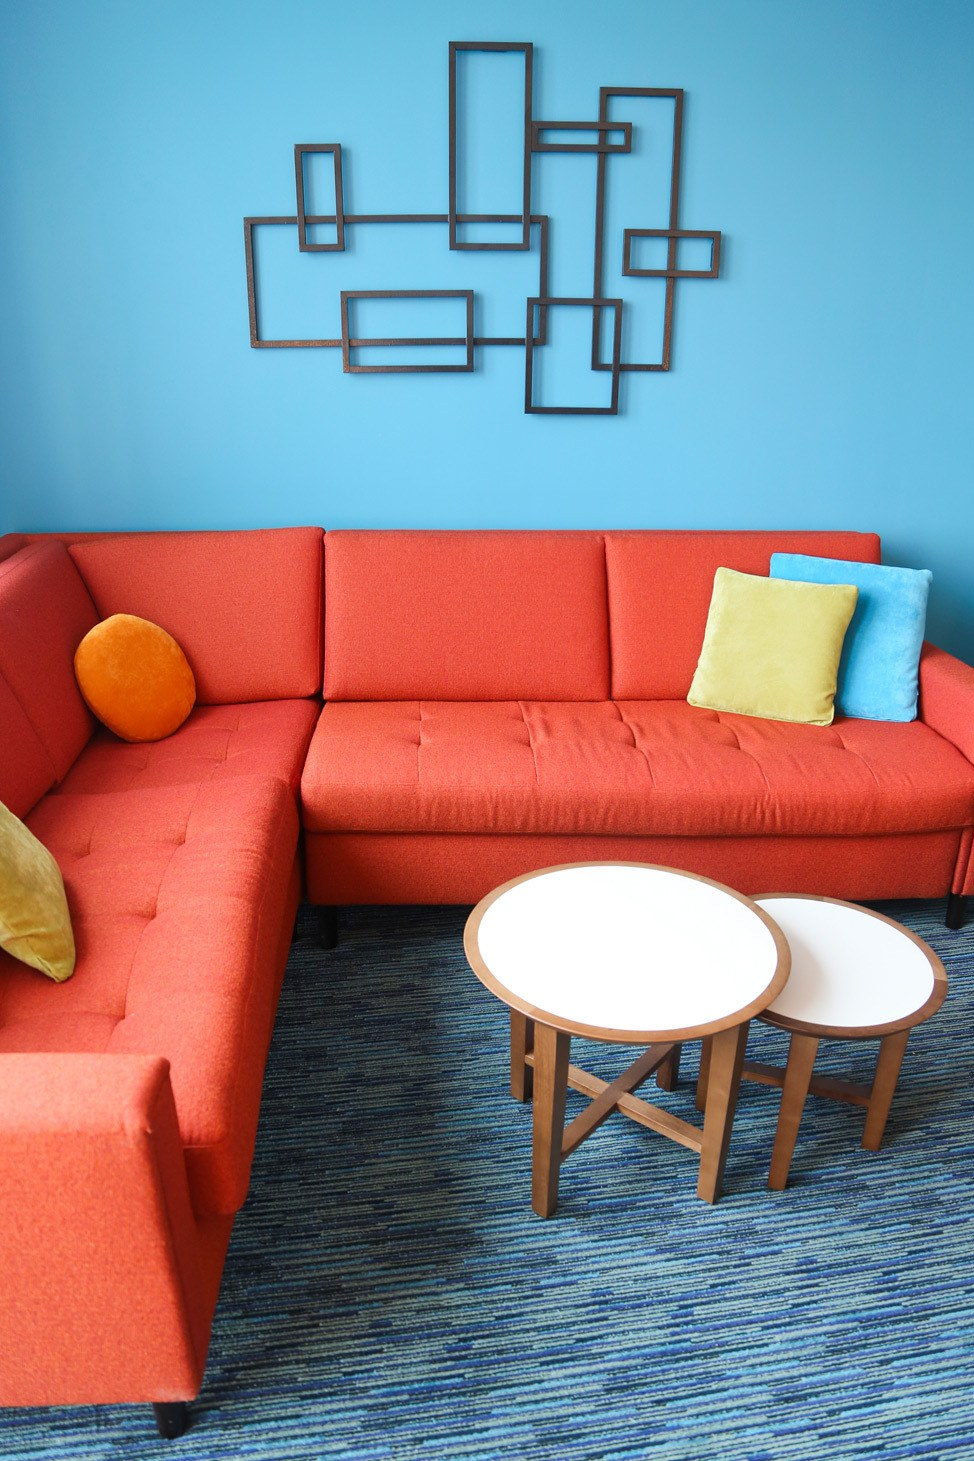 Room at Cabana Bay Beach Resort • Universal Orlando Hotel Review